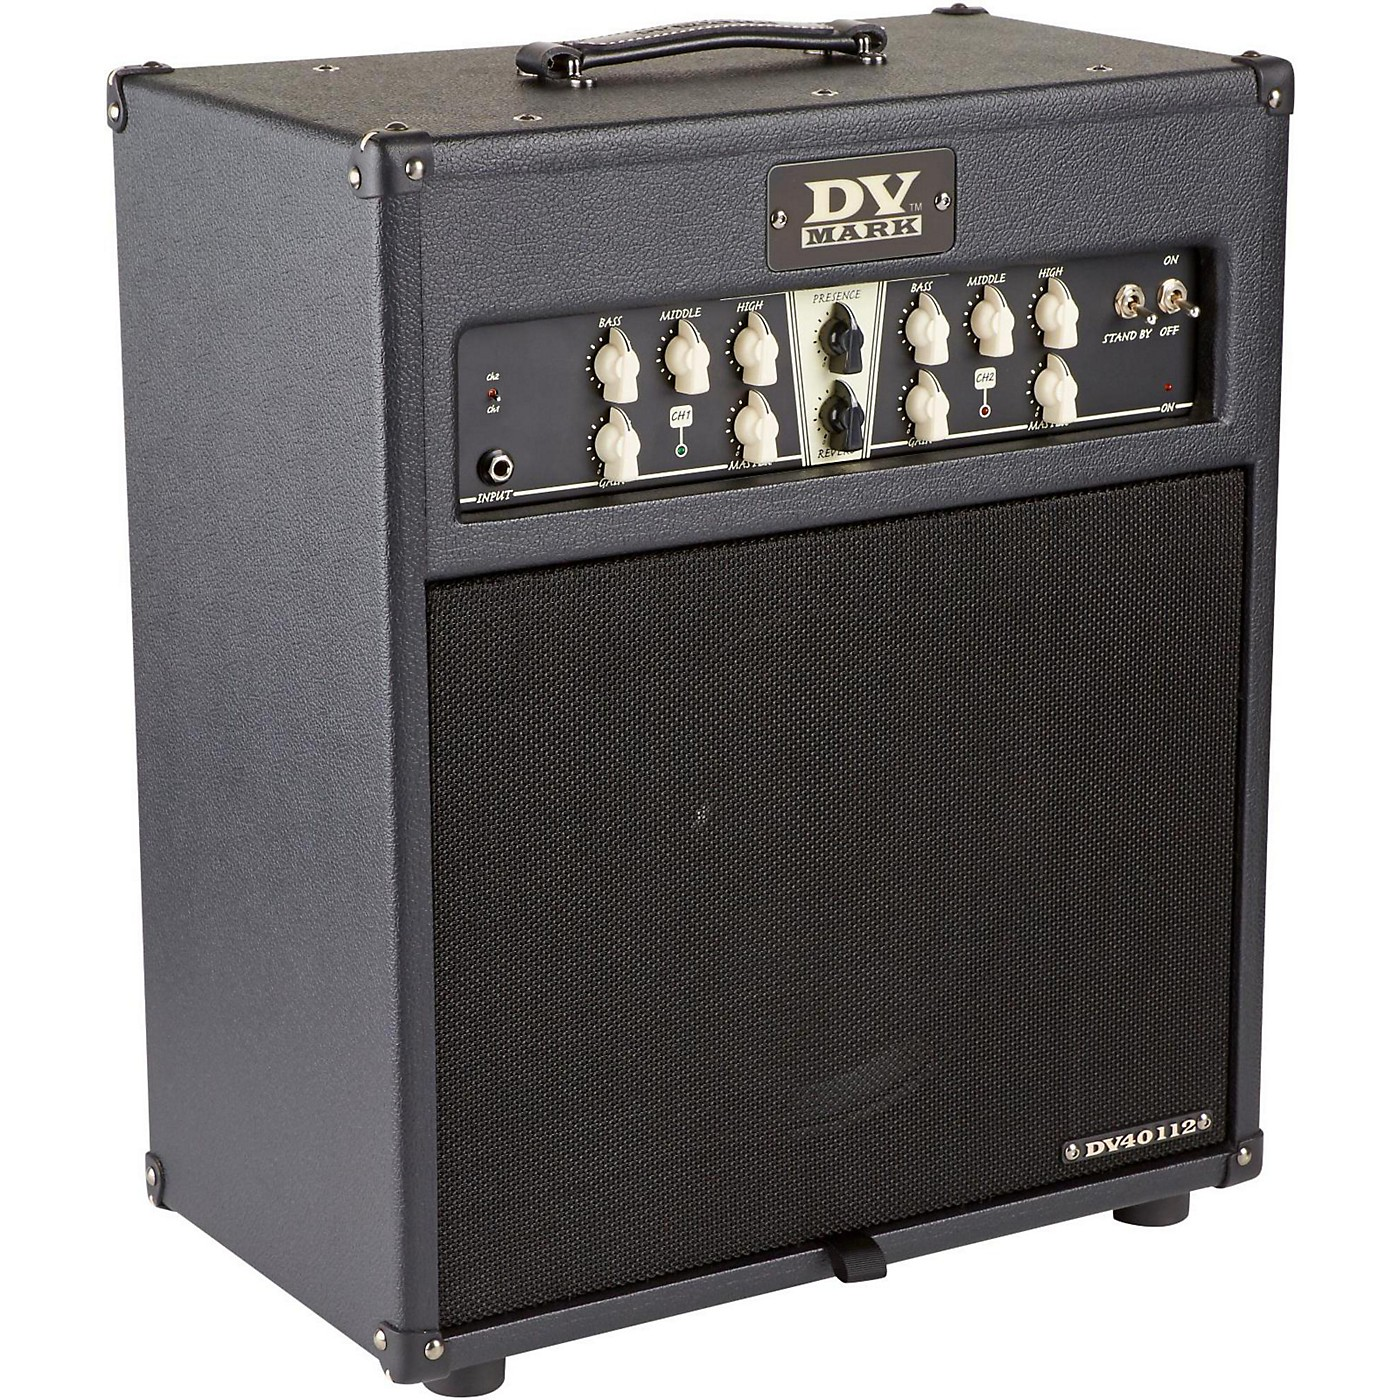 DV Mark DV 40 112 40 Watt 1x12 Guitar Combo thumbnail